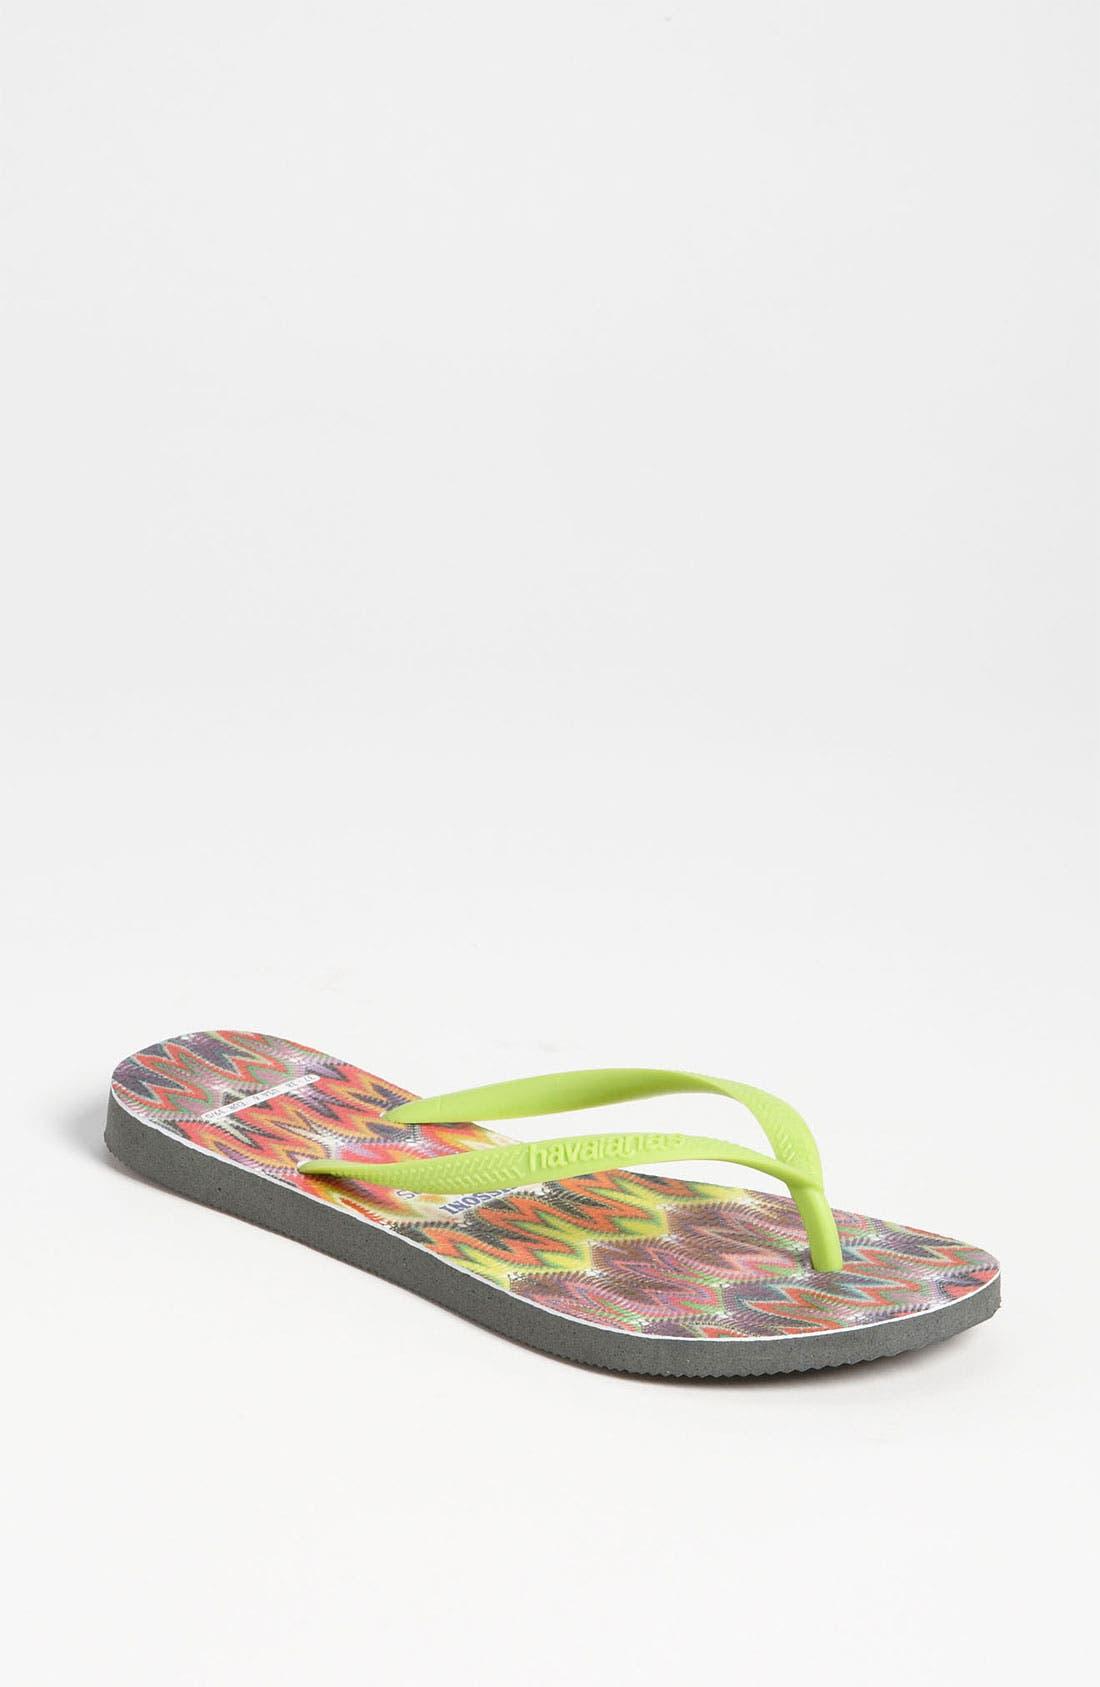 Missoni Loves Havaianas 'Slim - Rachel' Flip Flop,                         Main,                         color, 300